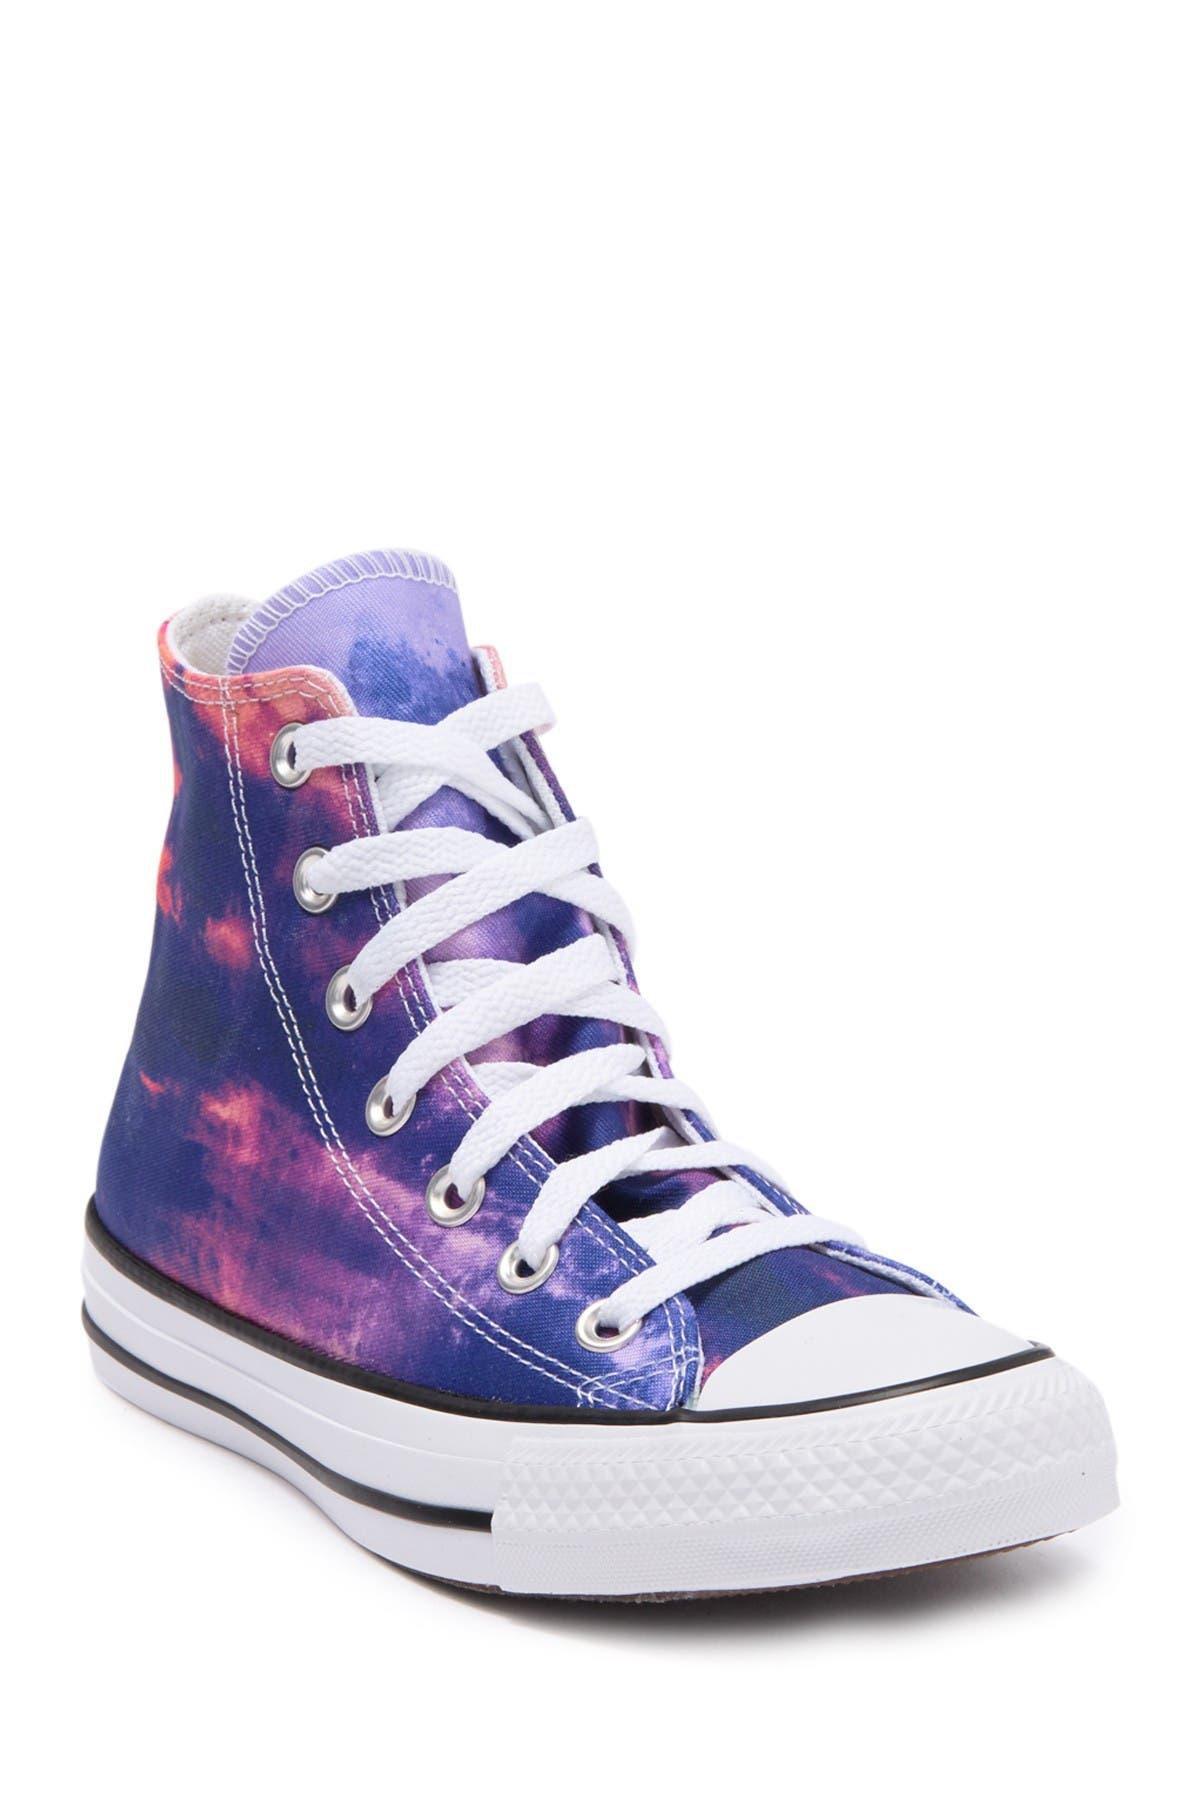 Image of Converse Tie Dye High-Top Sneaker